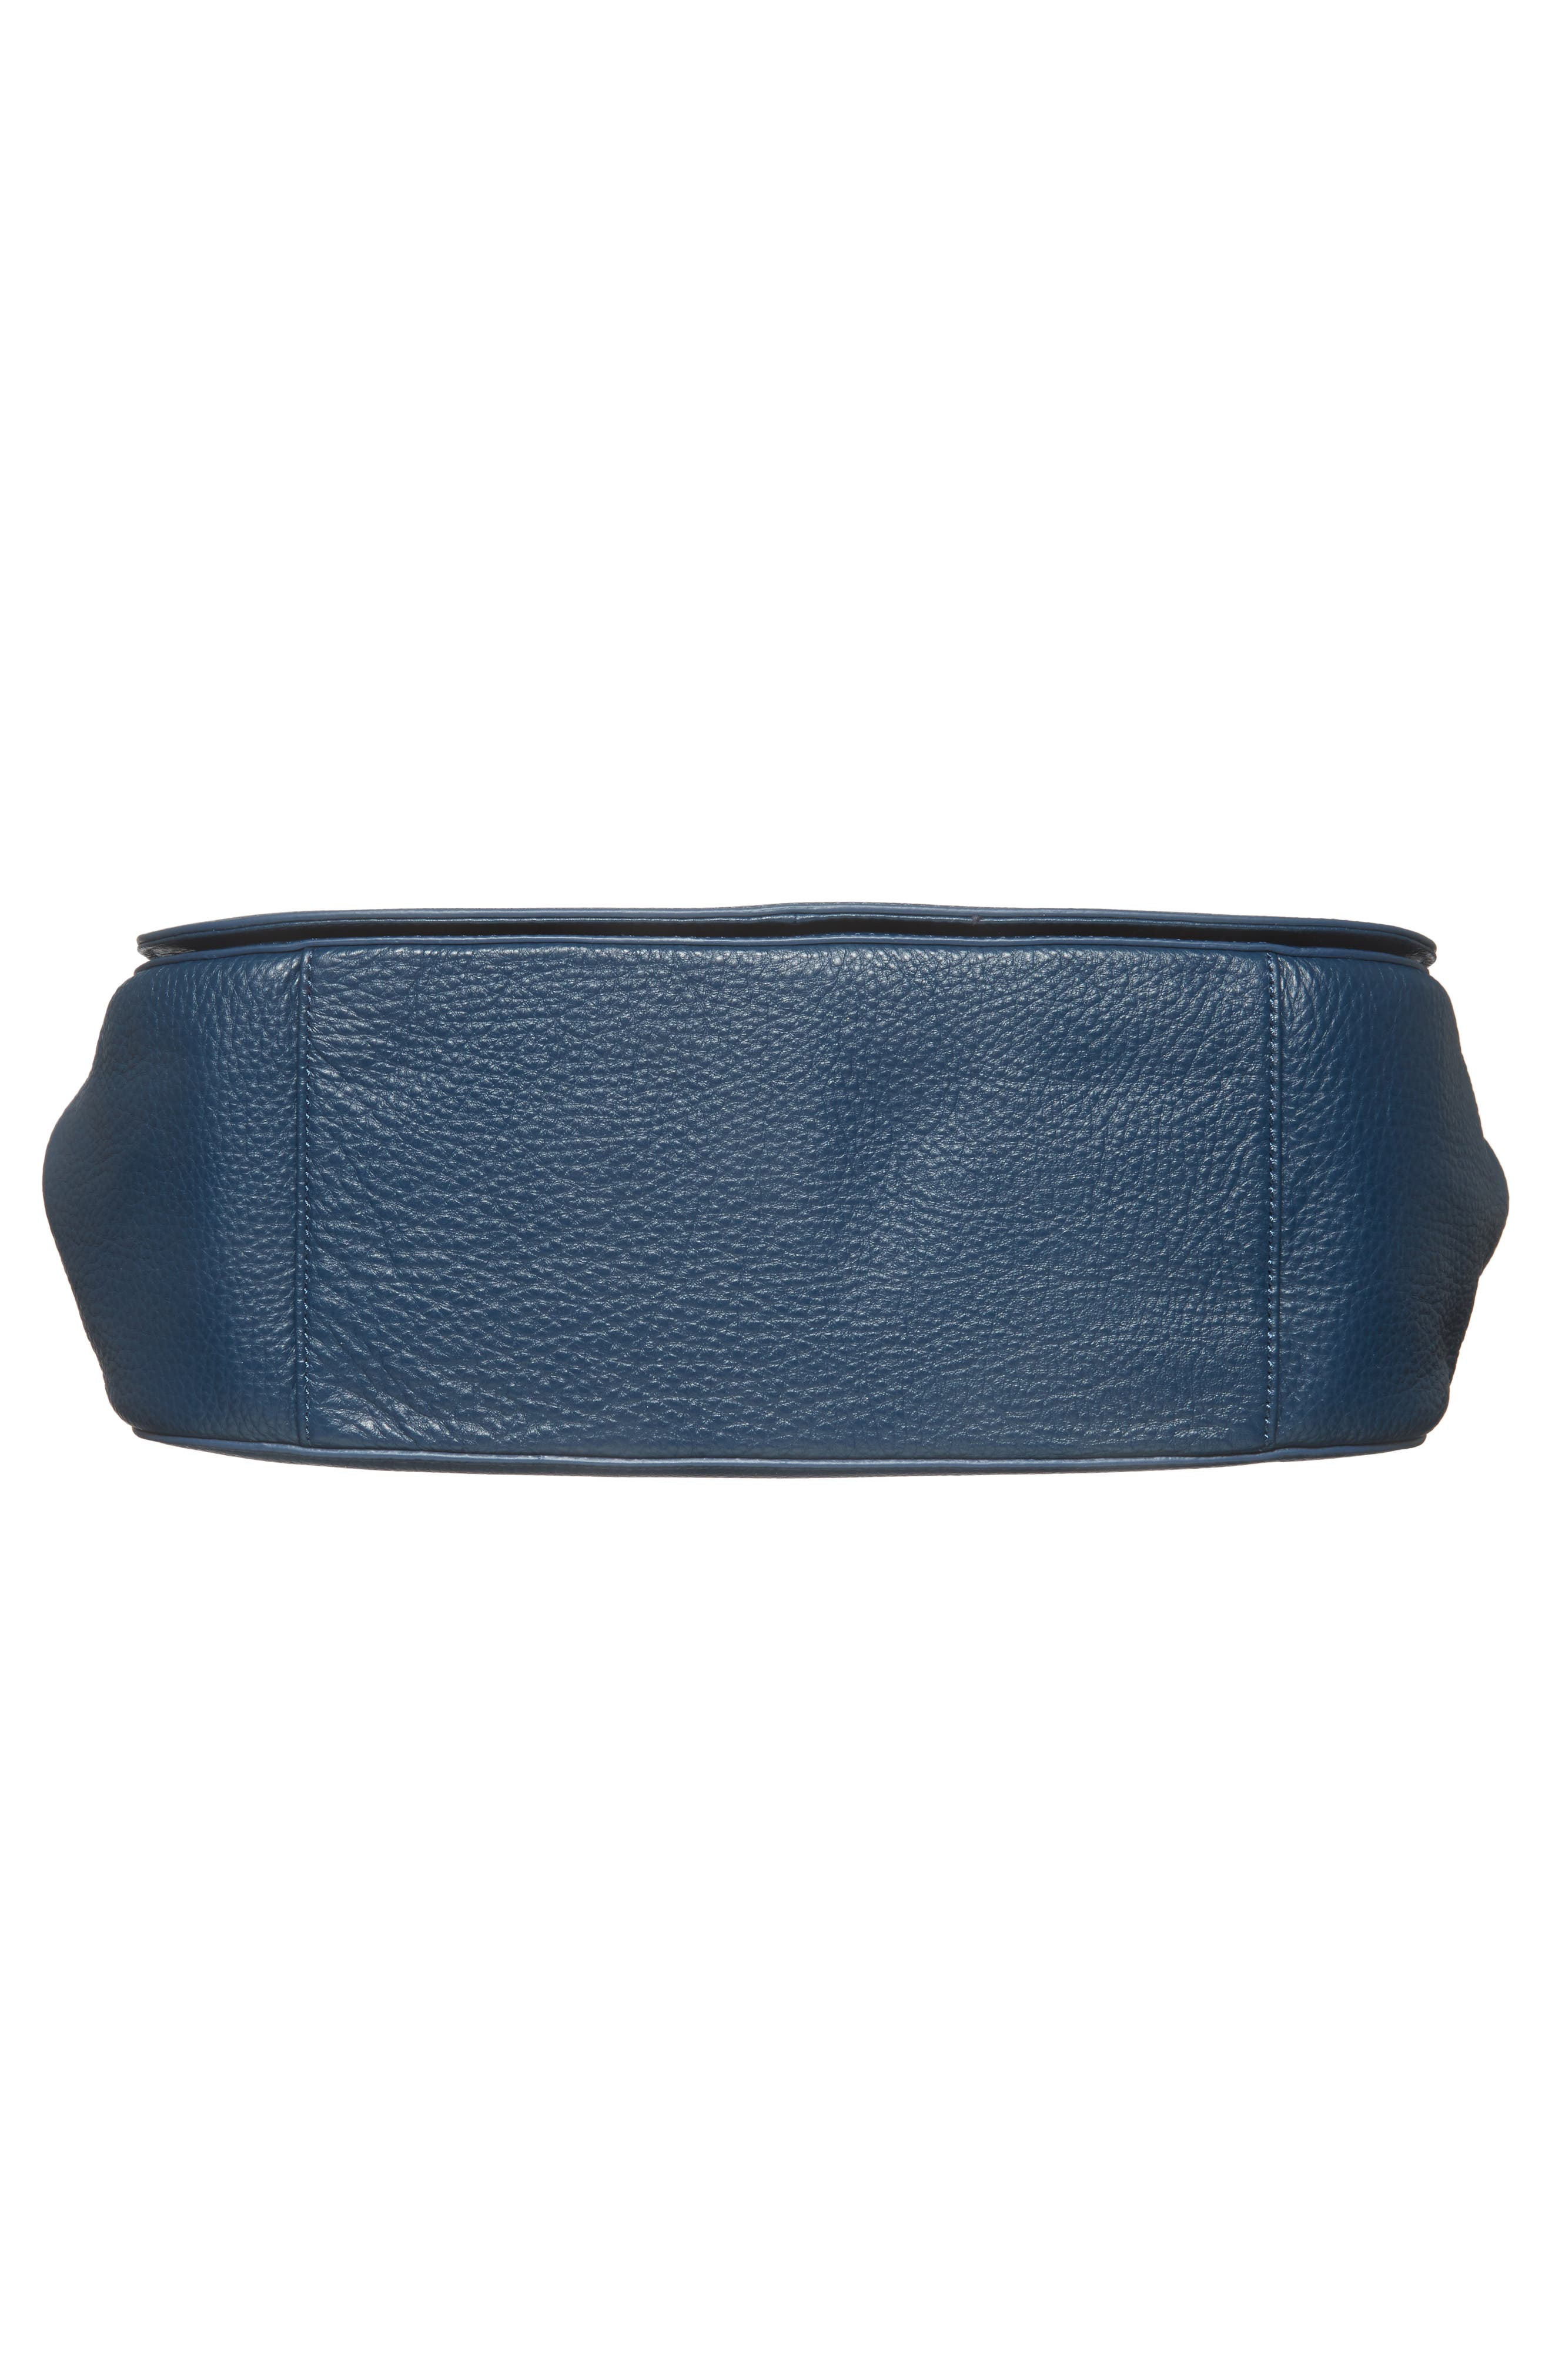 Kate Calfskin Leather Top Handle Satchel,                             Alternate thumbnail 6, color,                             Navy